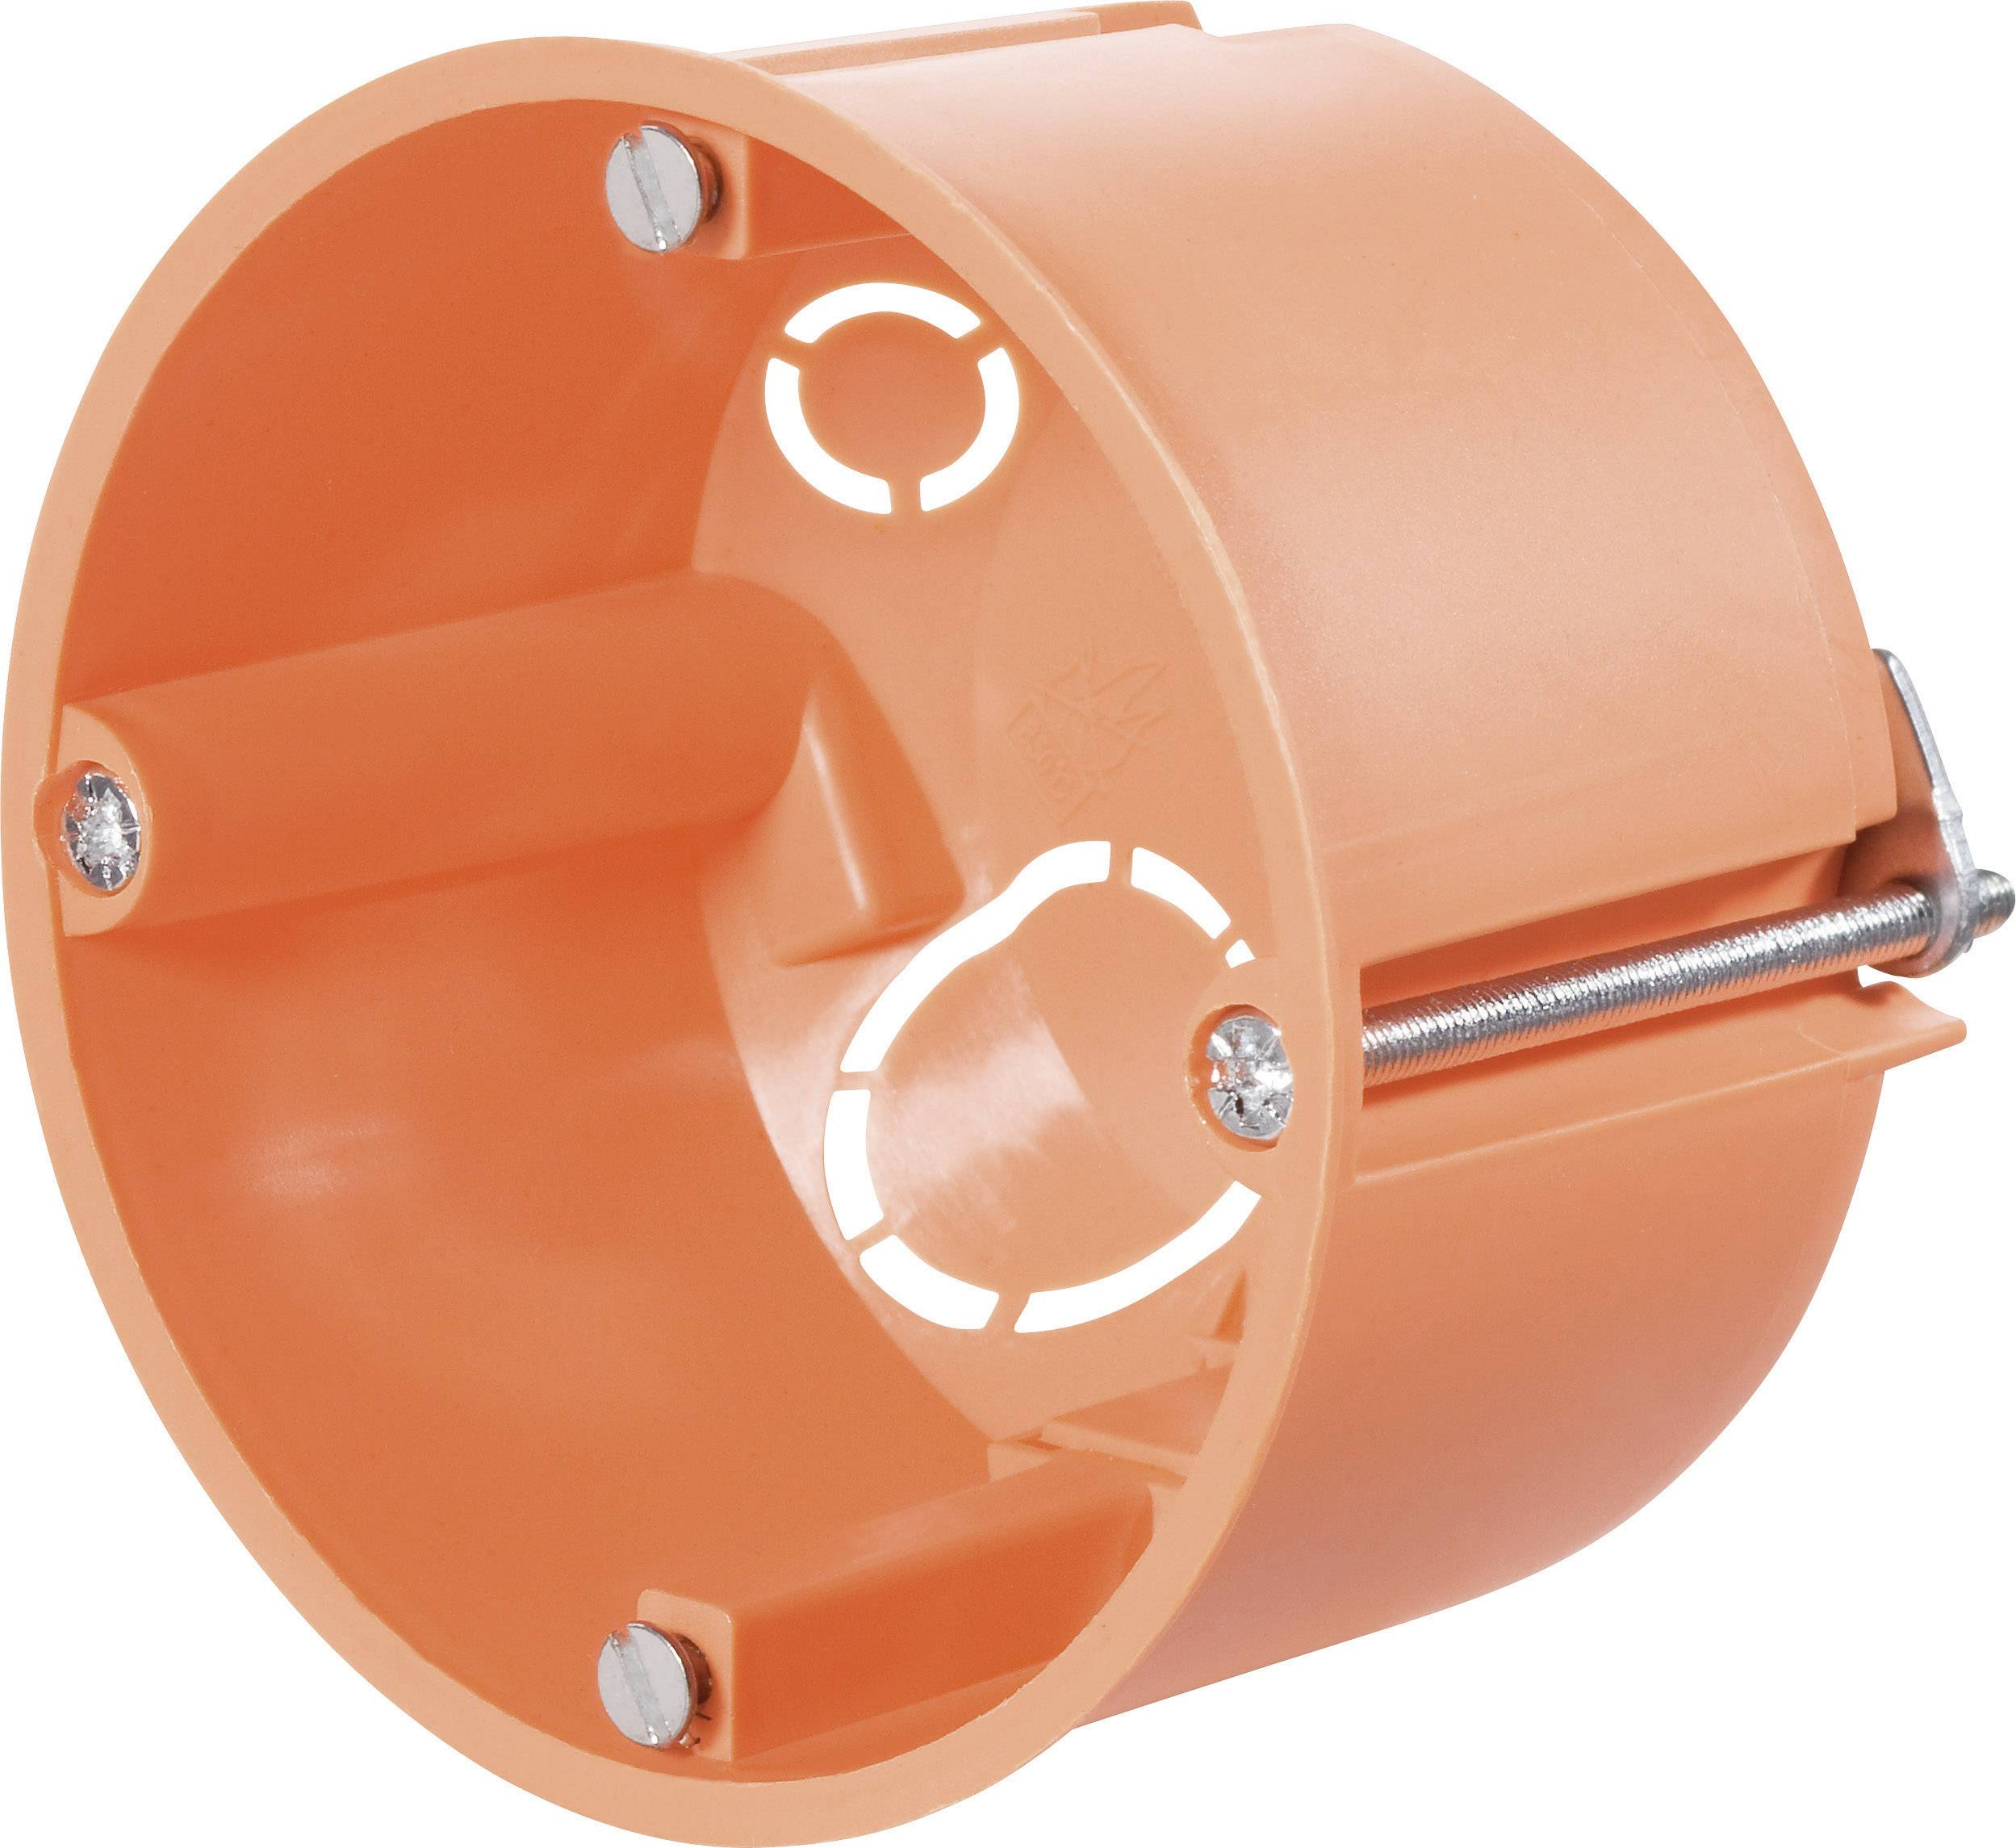 Inštalačná krabica do dutých stien, 68 x 45 mm, oranžová, 10 ks